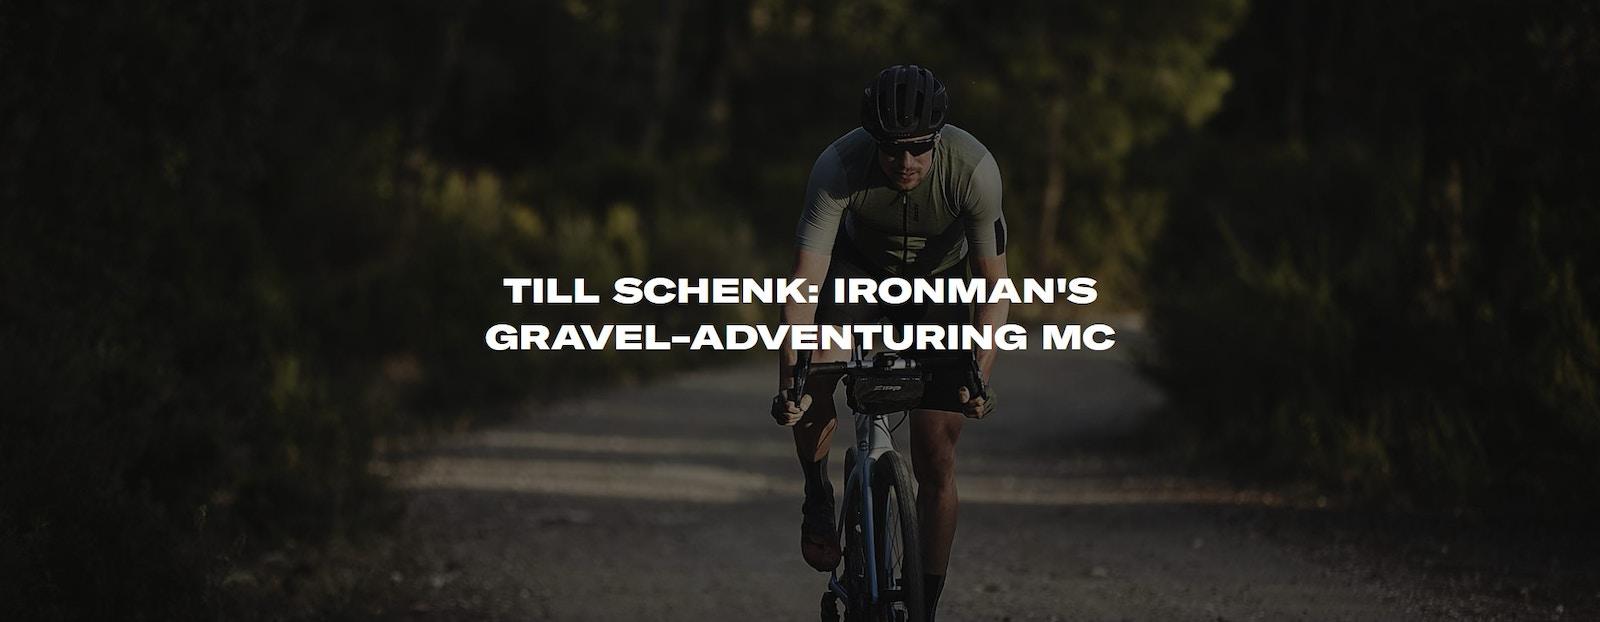 Santini - Till Schenk: IRONMAN's gravel-adventuring MC